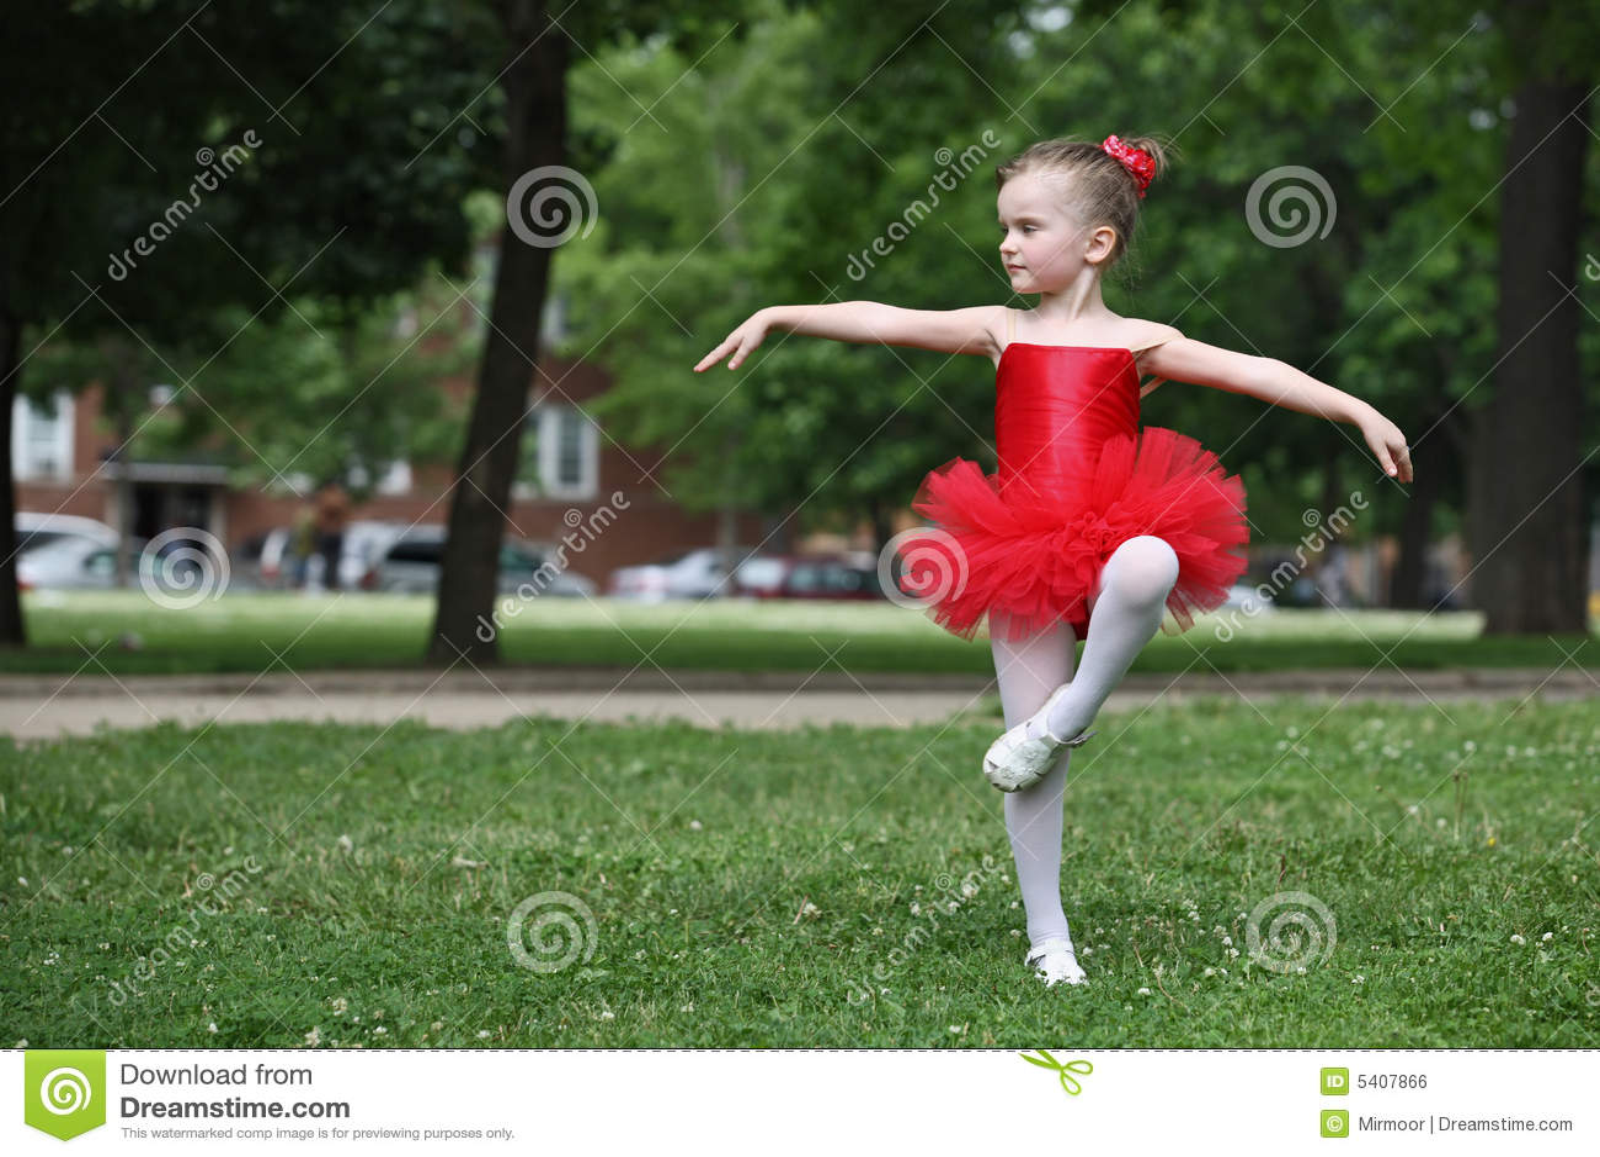 Little girl dancing stock photo. Image of dancing, dress ...